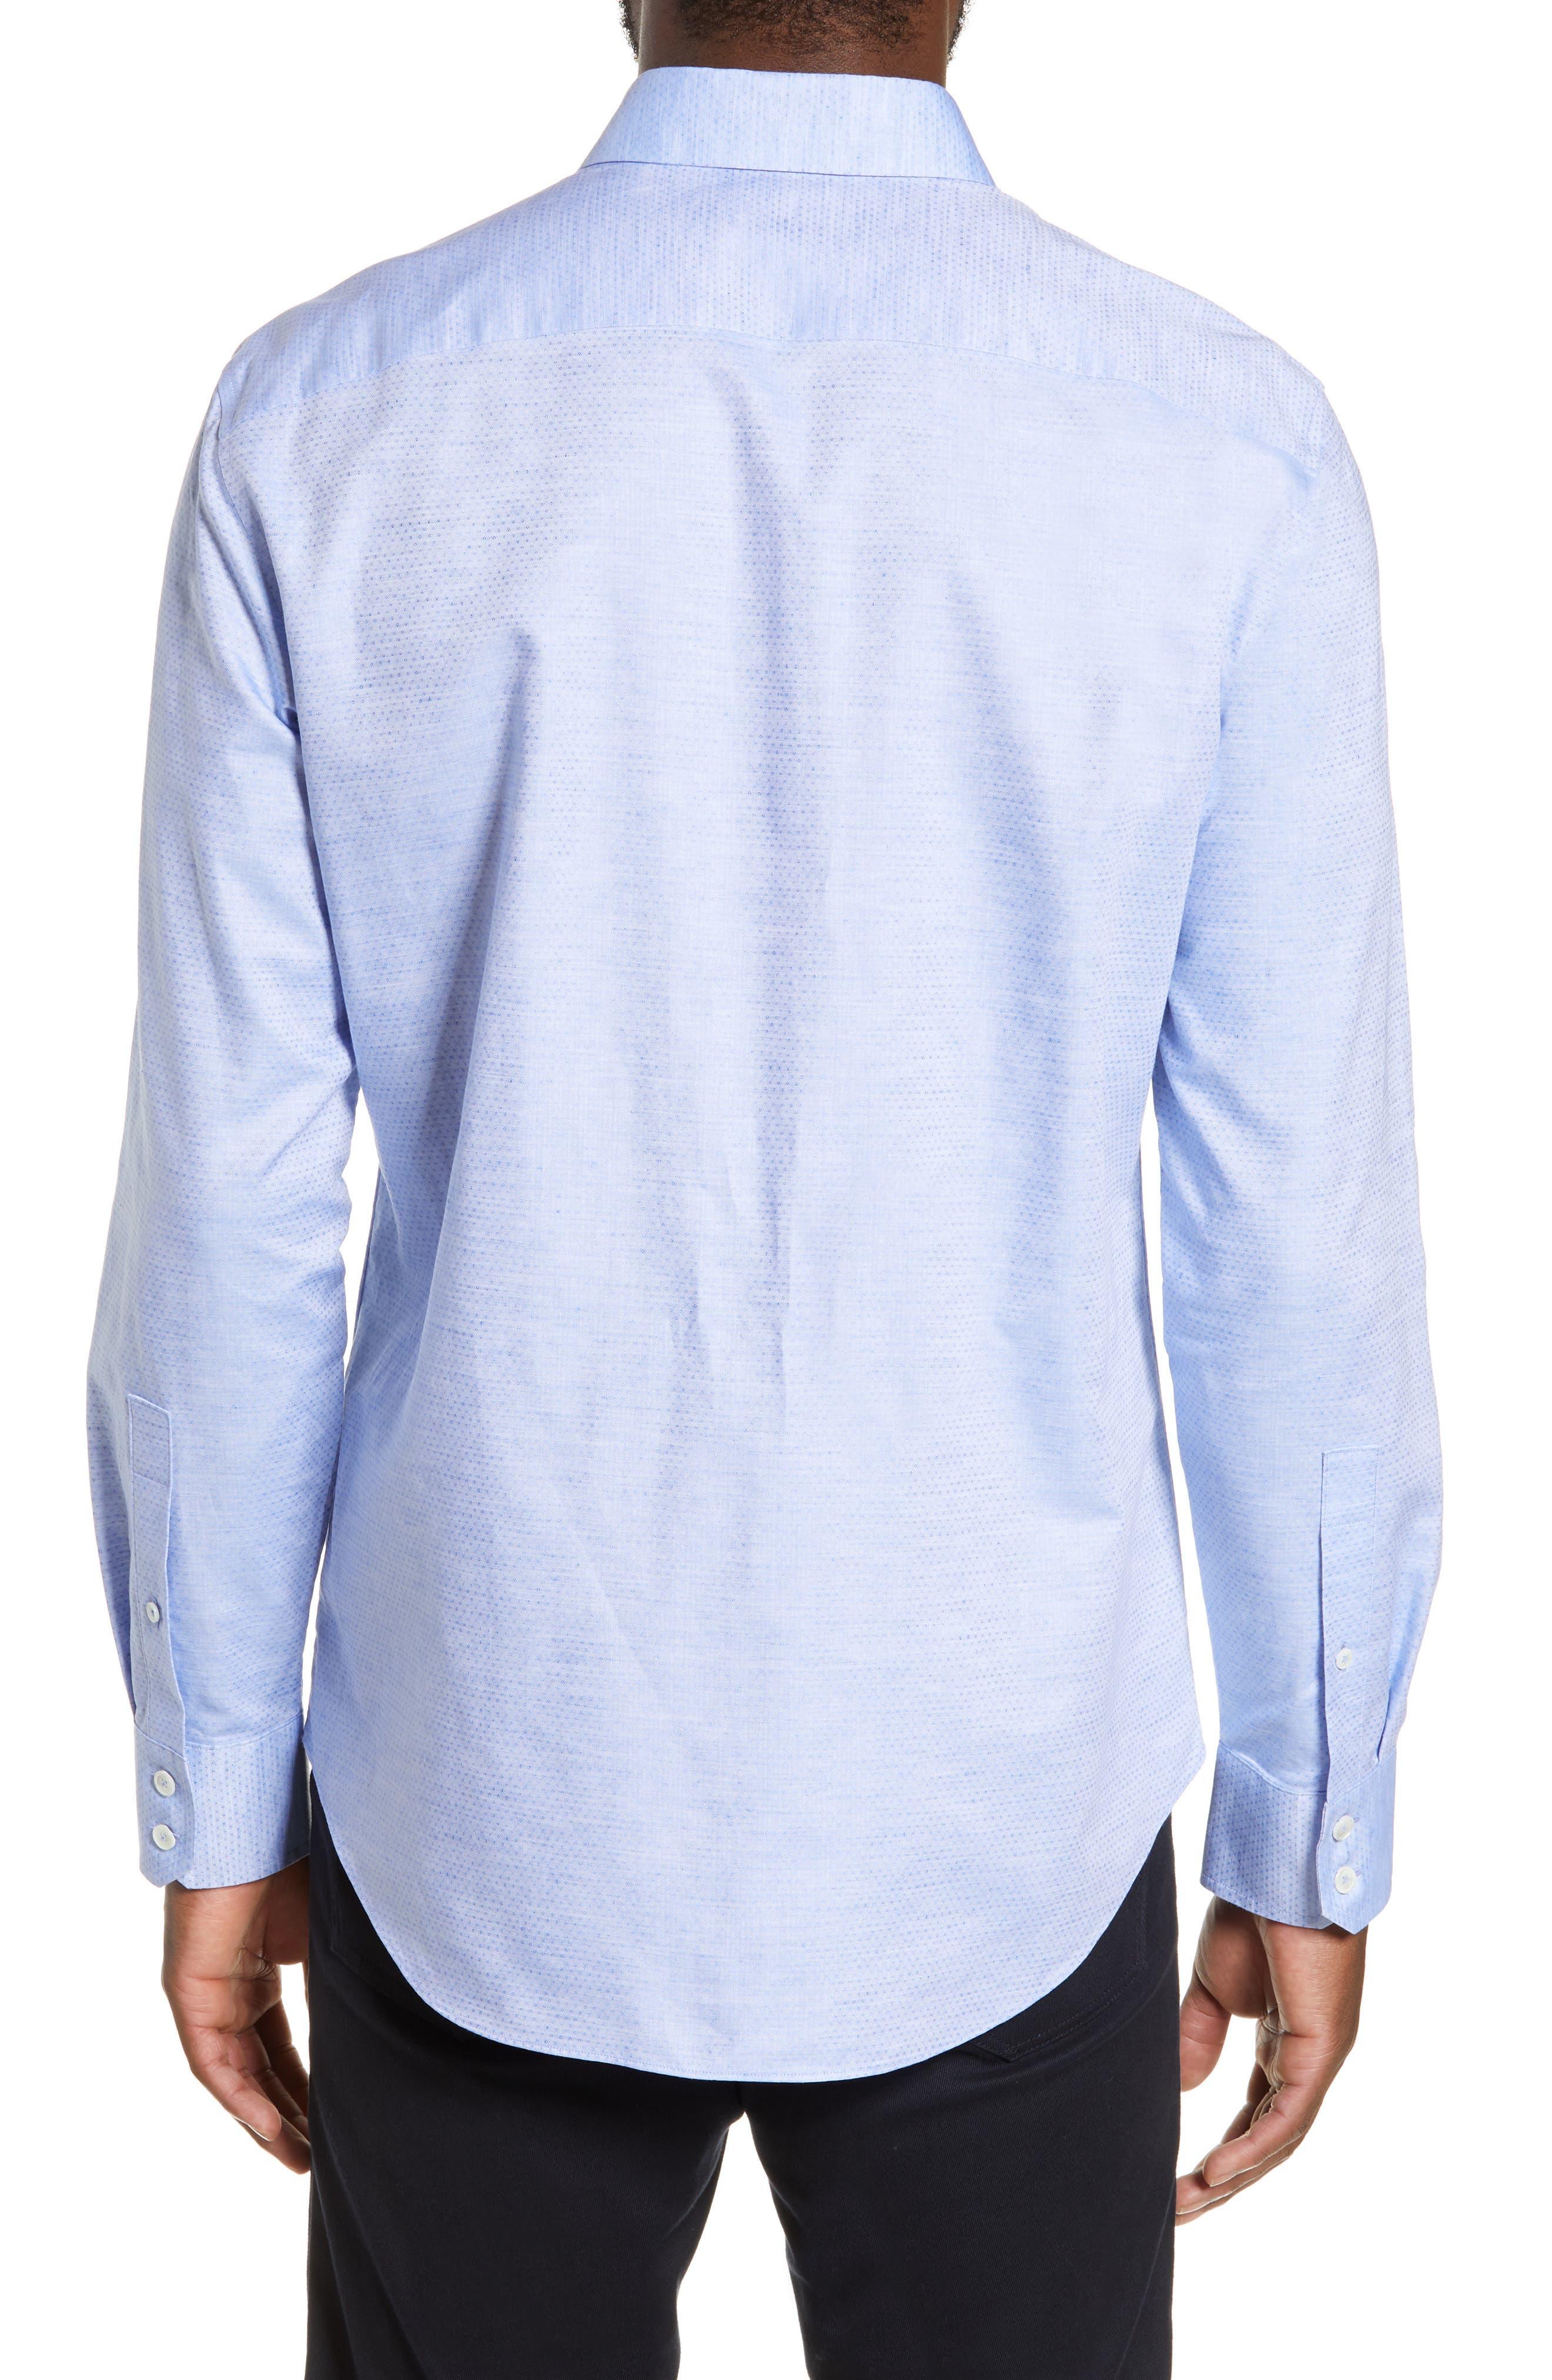 ZACHARY PRELL, Alfano Regular Fit Cotton & Linen Sport Shirt, Alternate thumbnail 3, color, LT BLUE